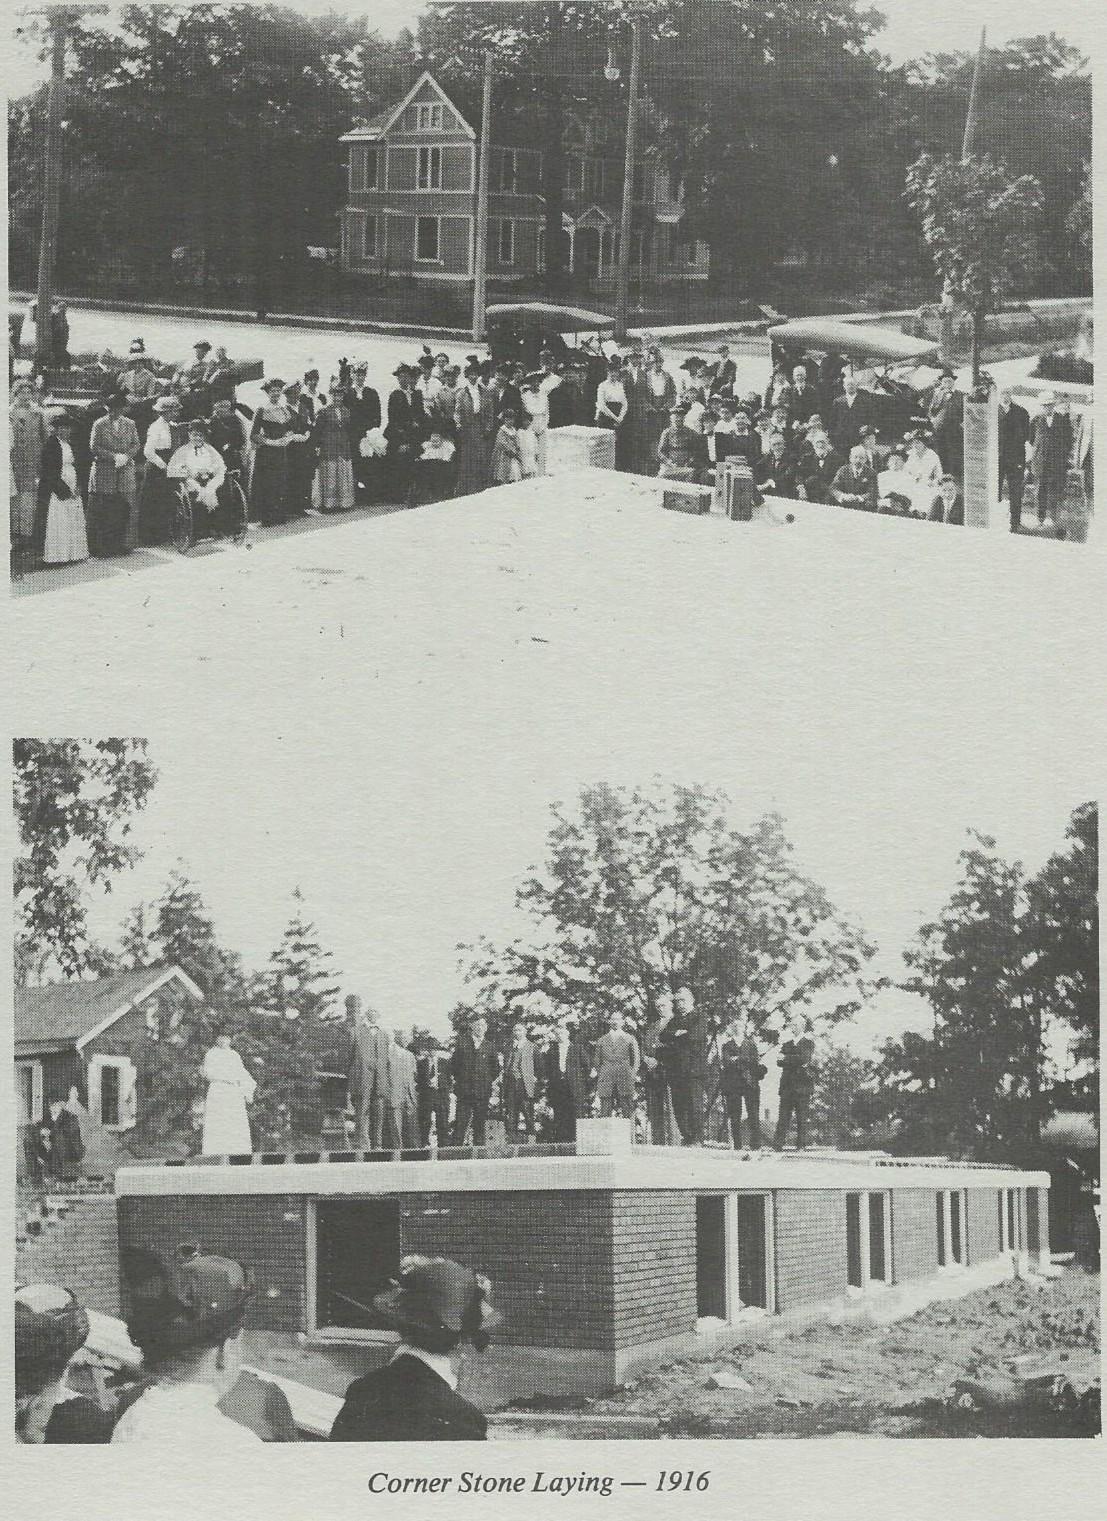 Cornerstone Laying 1916